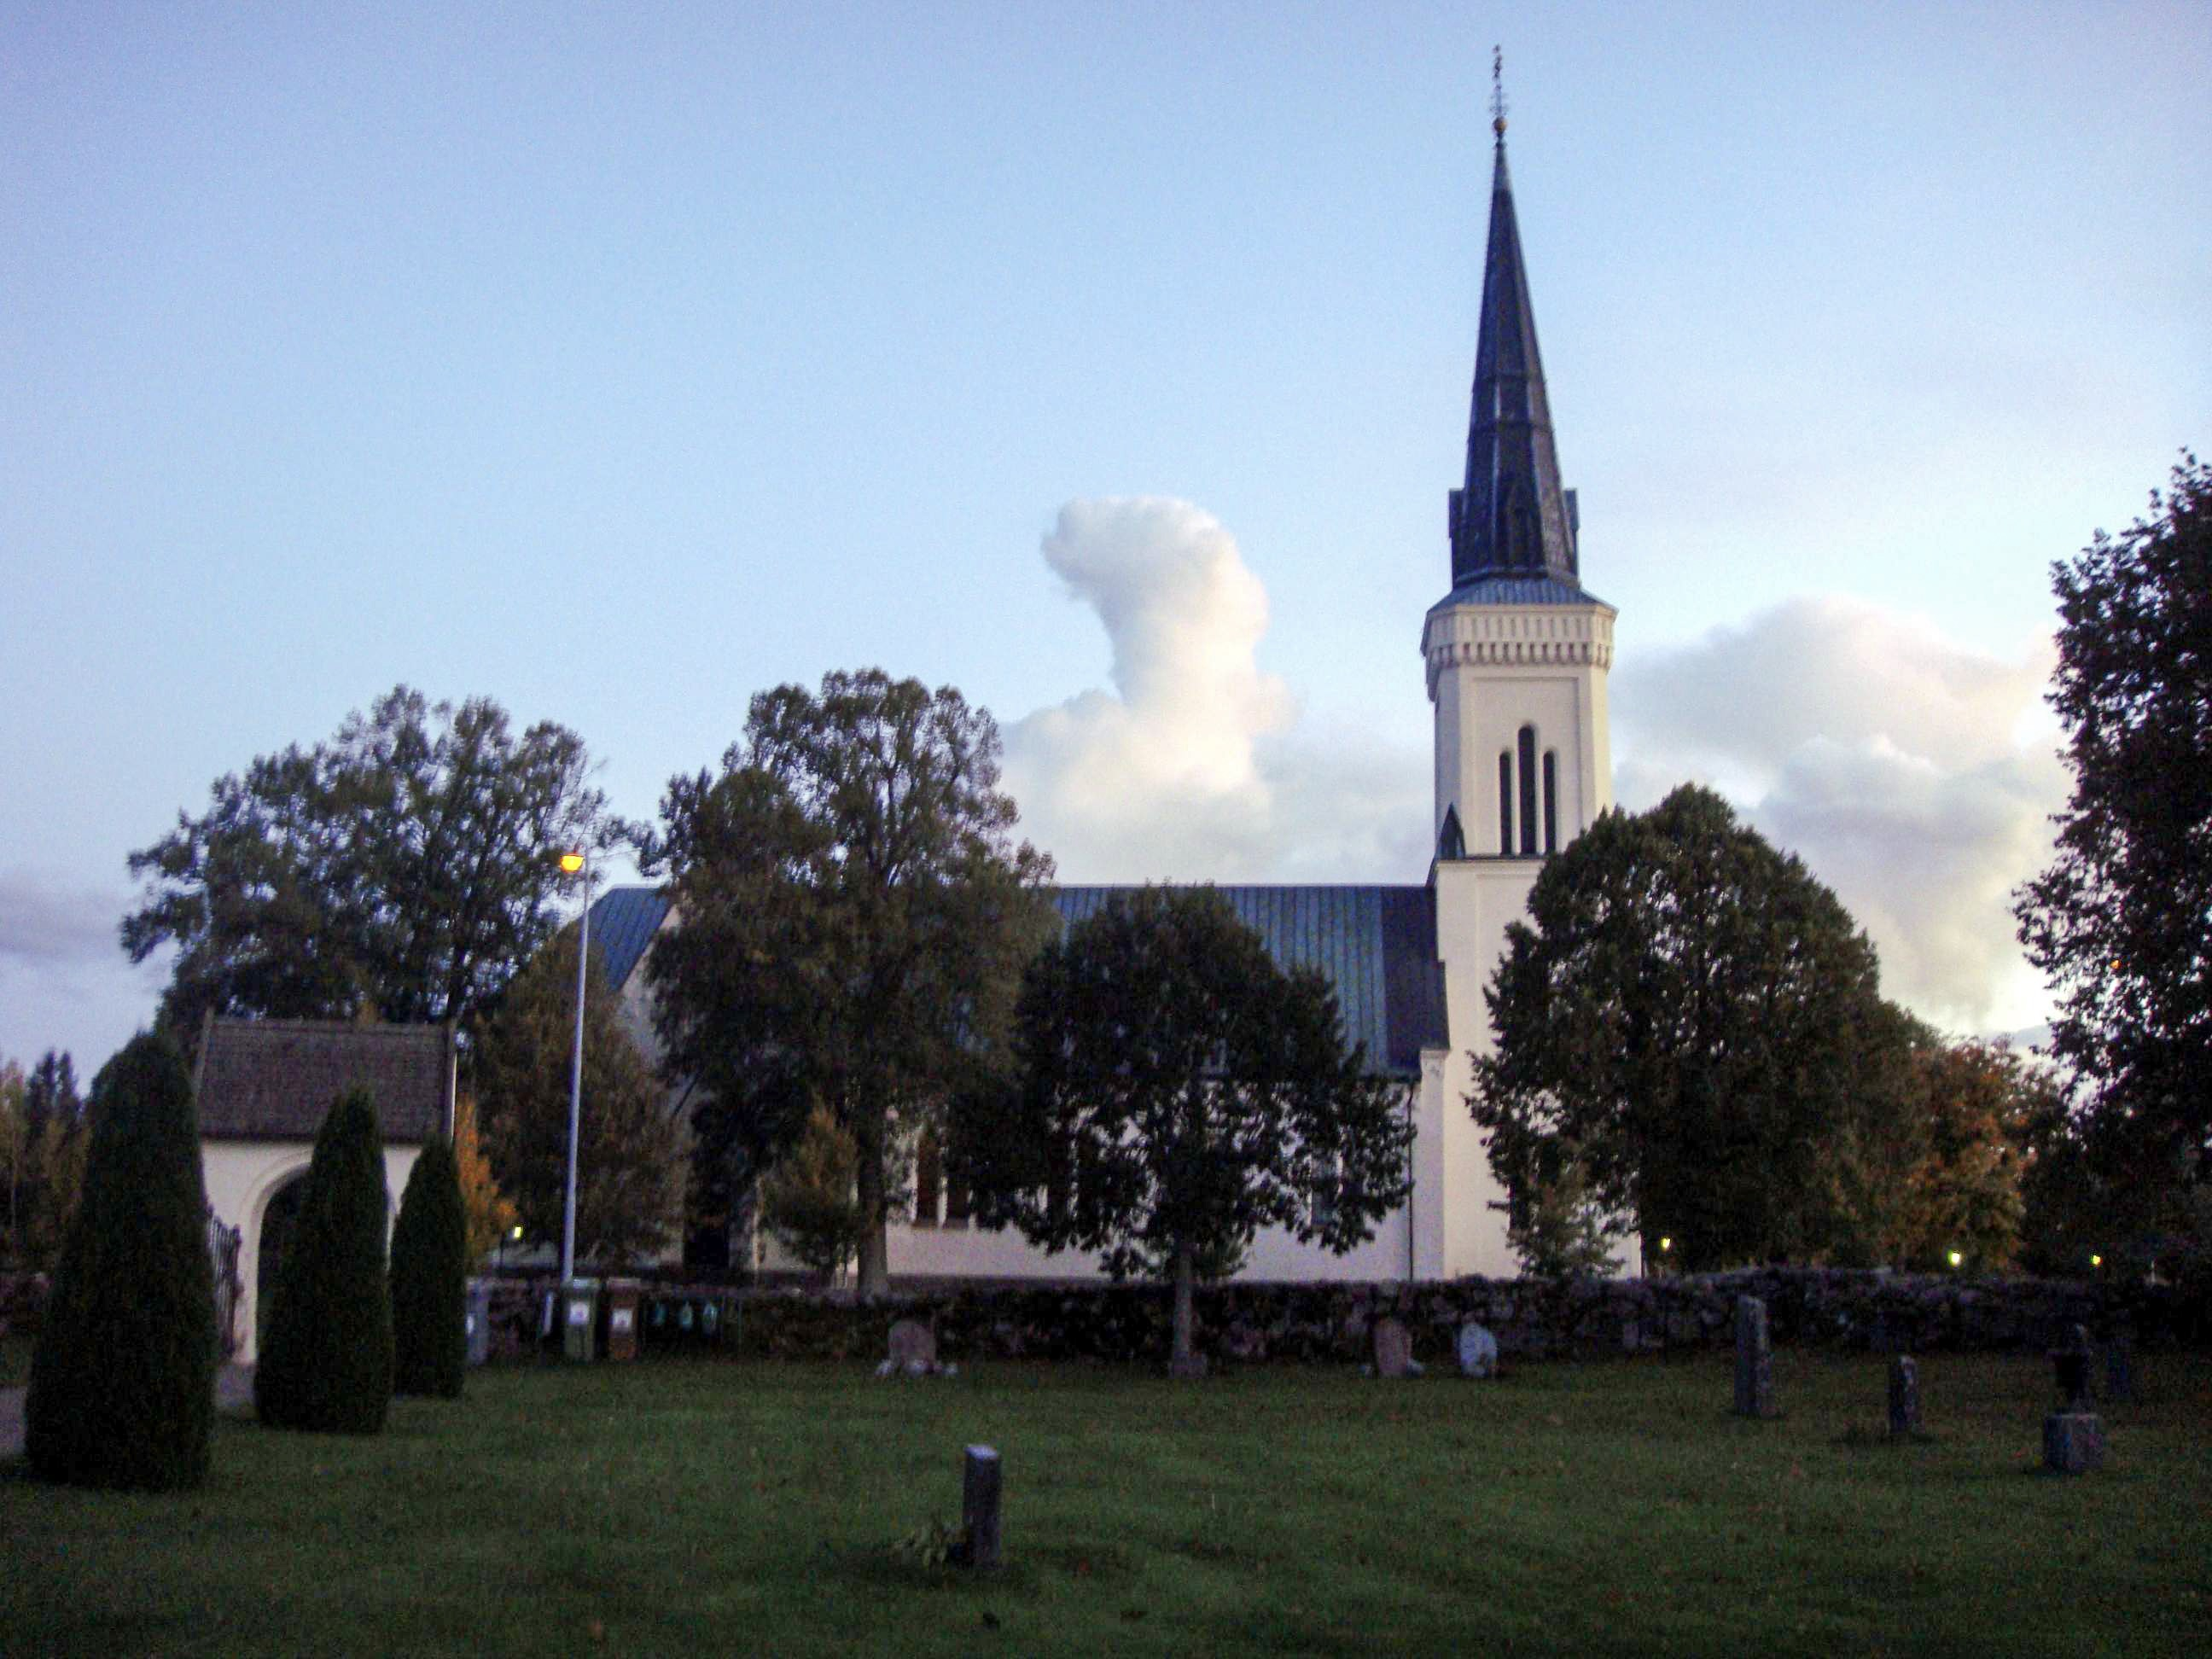 Fil:Norra Vånga kyrka - KMB - jpg